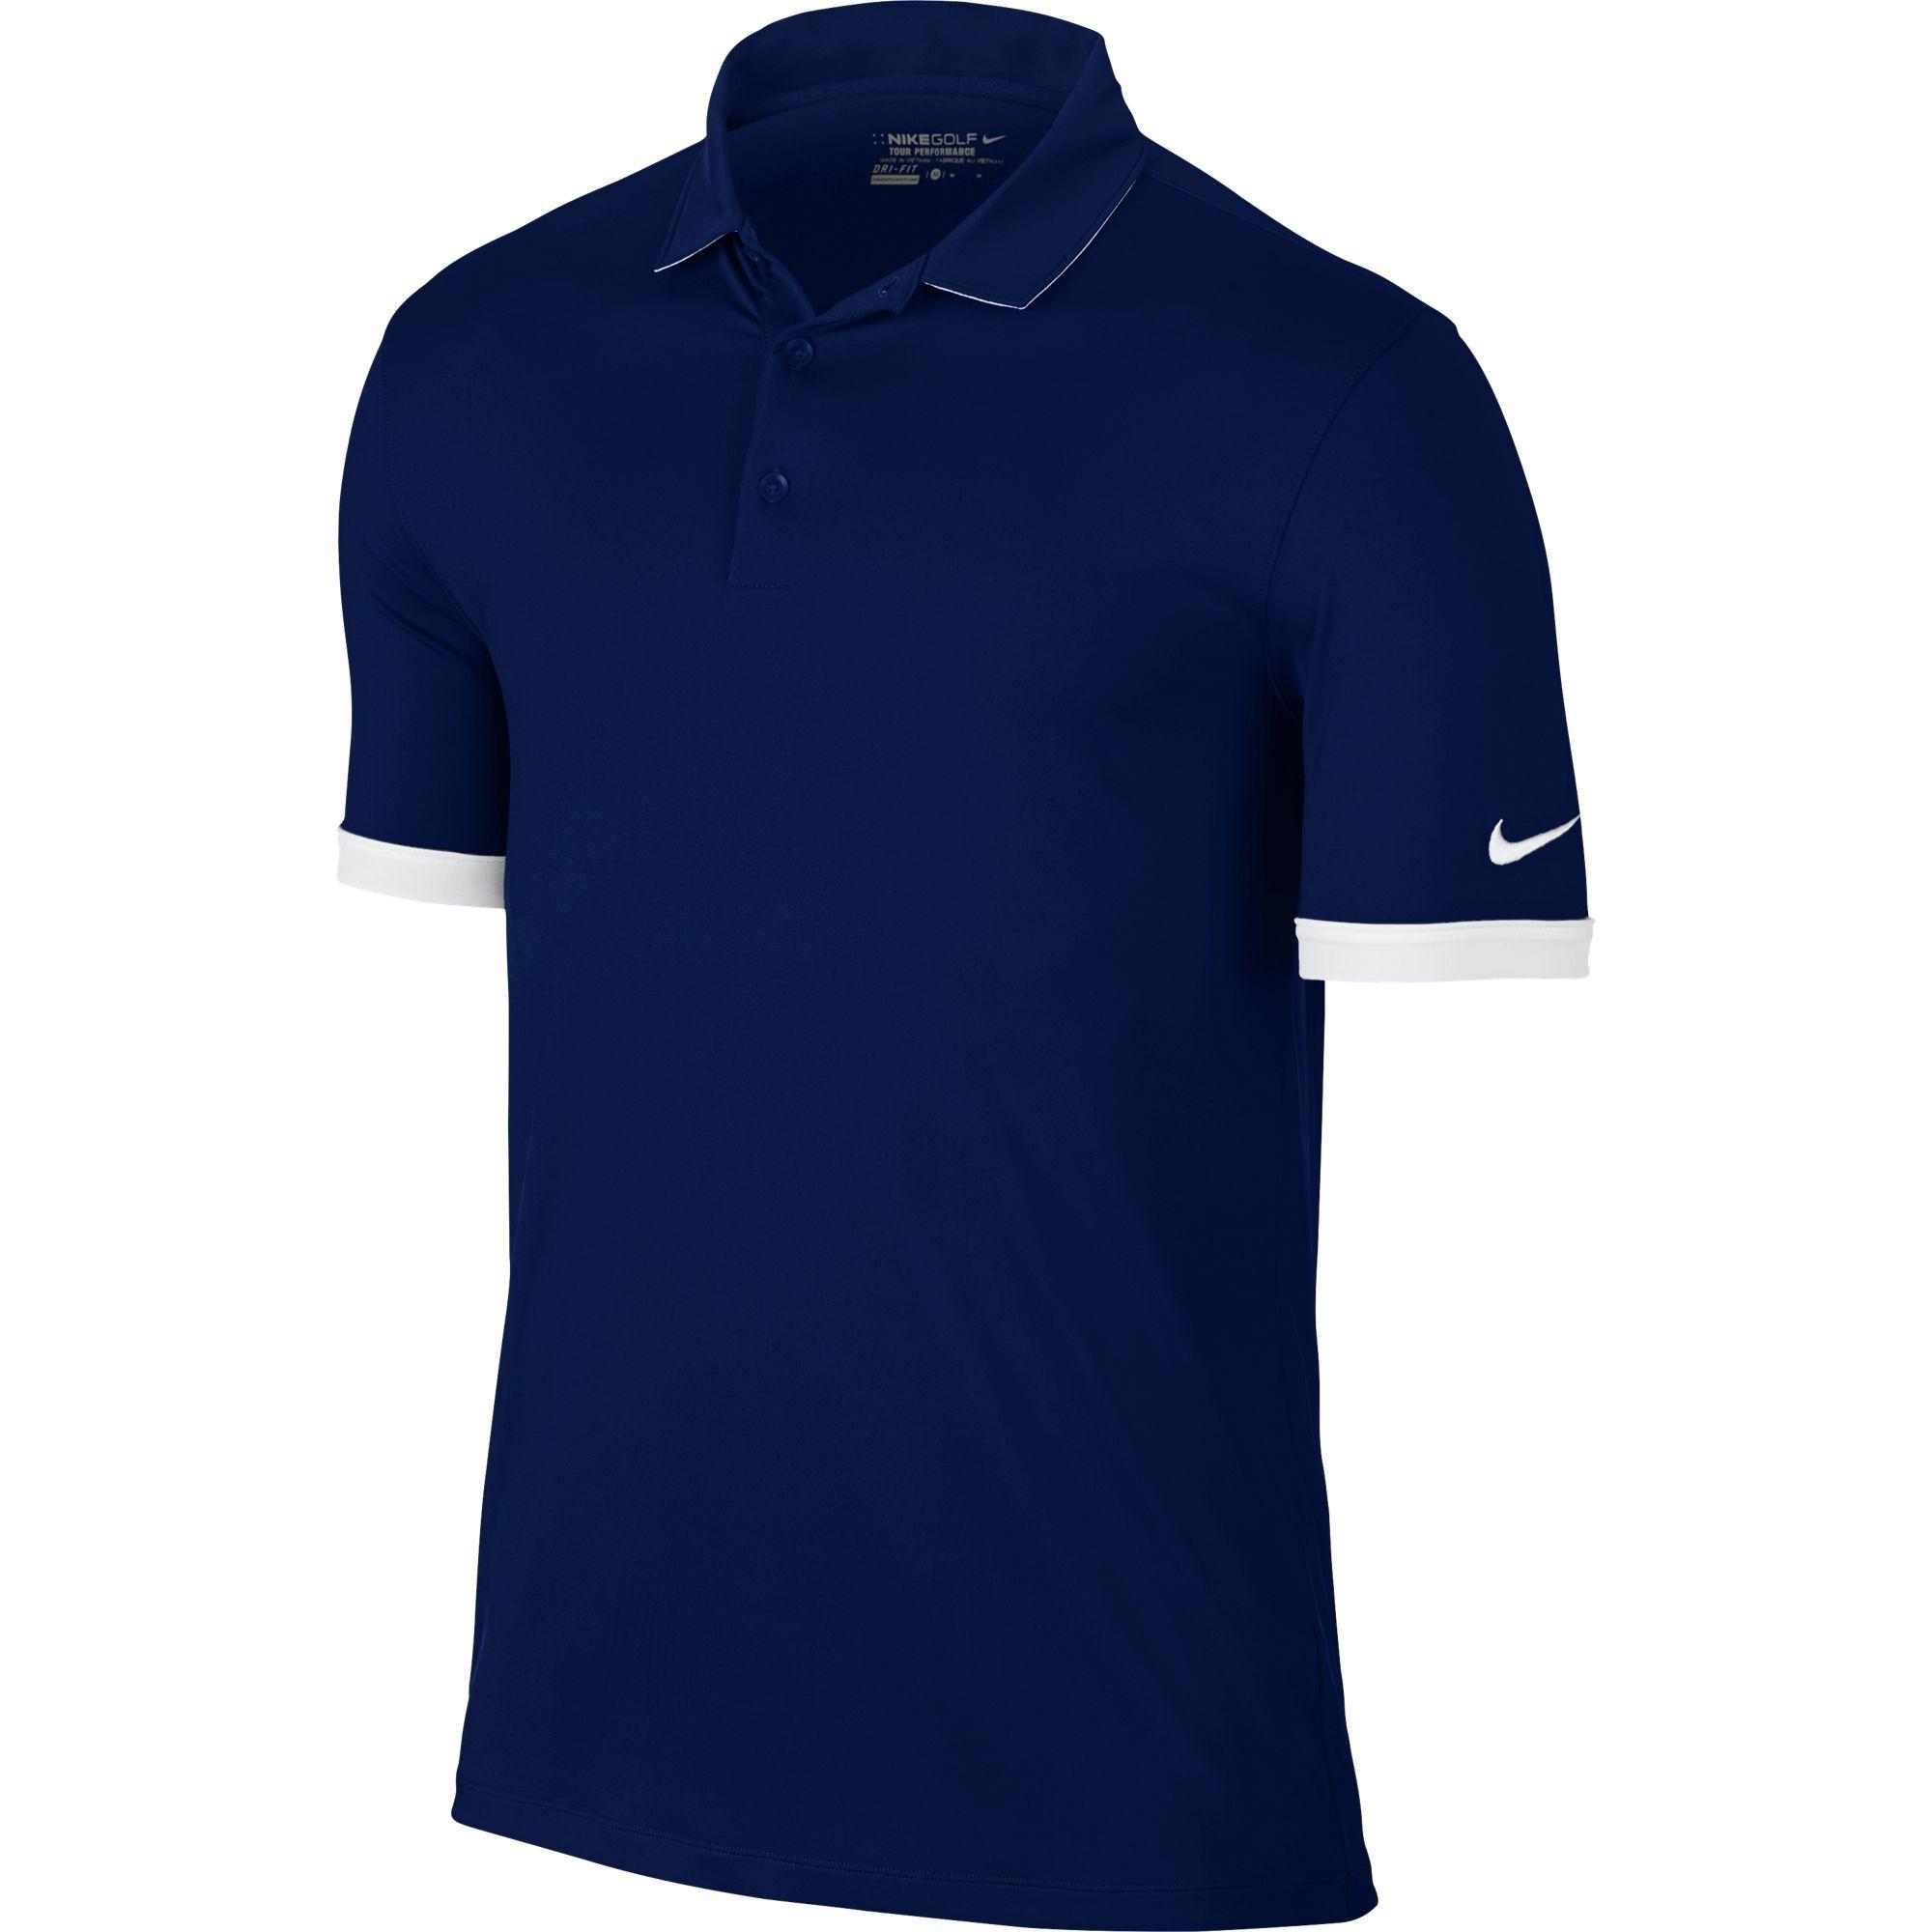 2016 nike icon solid polo golf shirt mens 725524 pick for Nike golf mens polo shirts